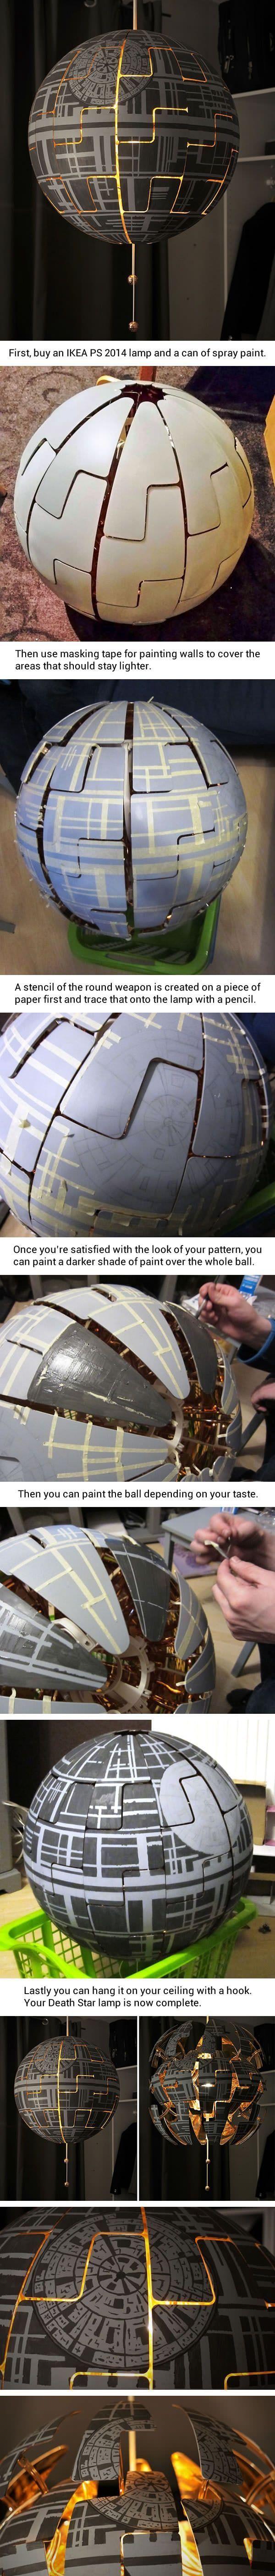 Pin By Morgan Jerling On Crafts Star Lamp Star Wars Diy Star Wars Crafts